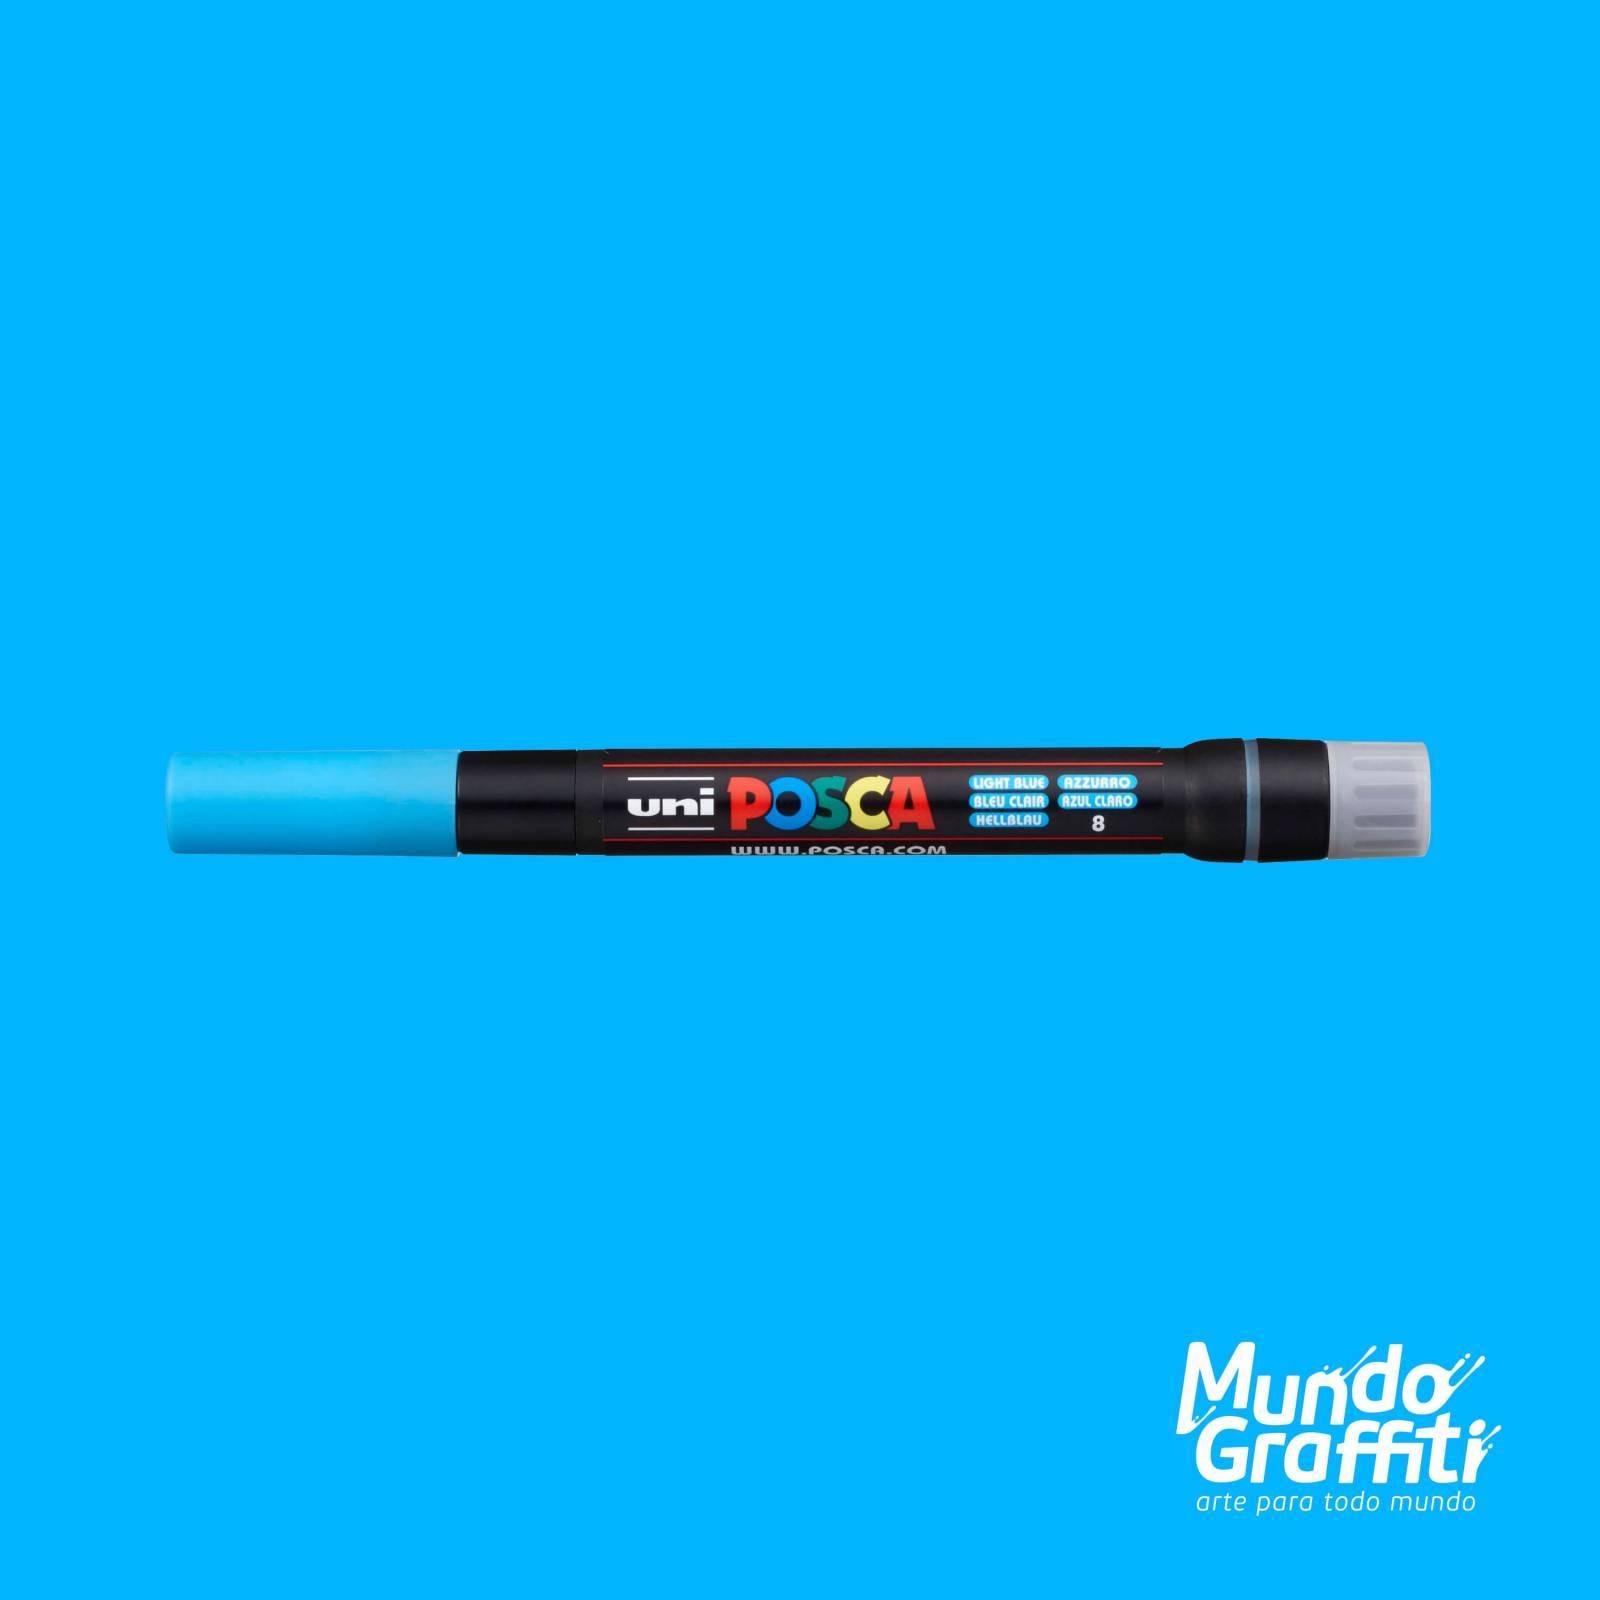 Caneta Brush Posca PCF 350 Azul Claro - Mundo Graffiti